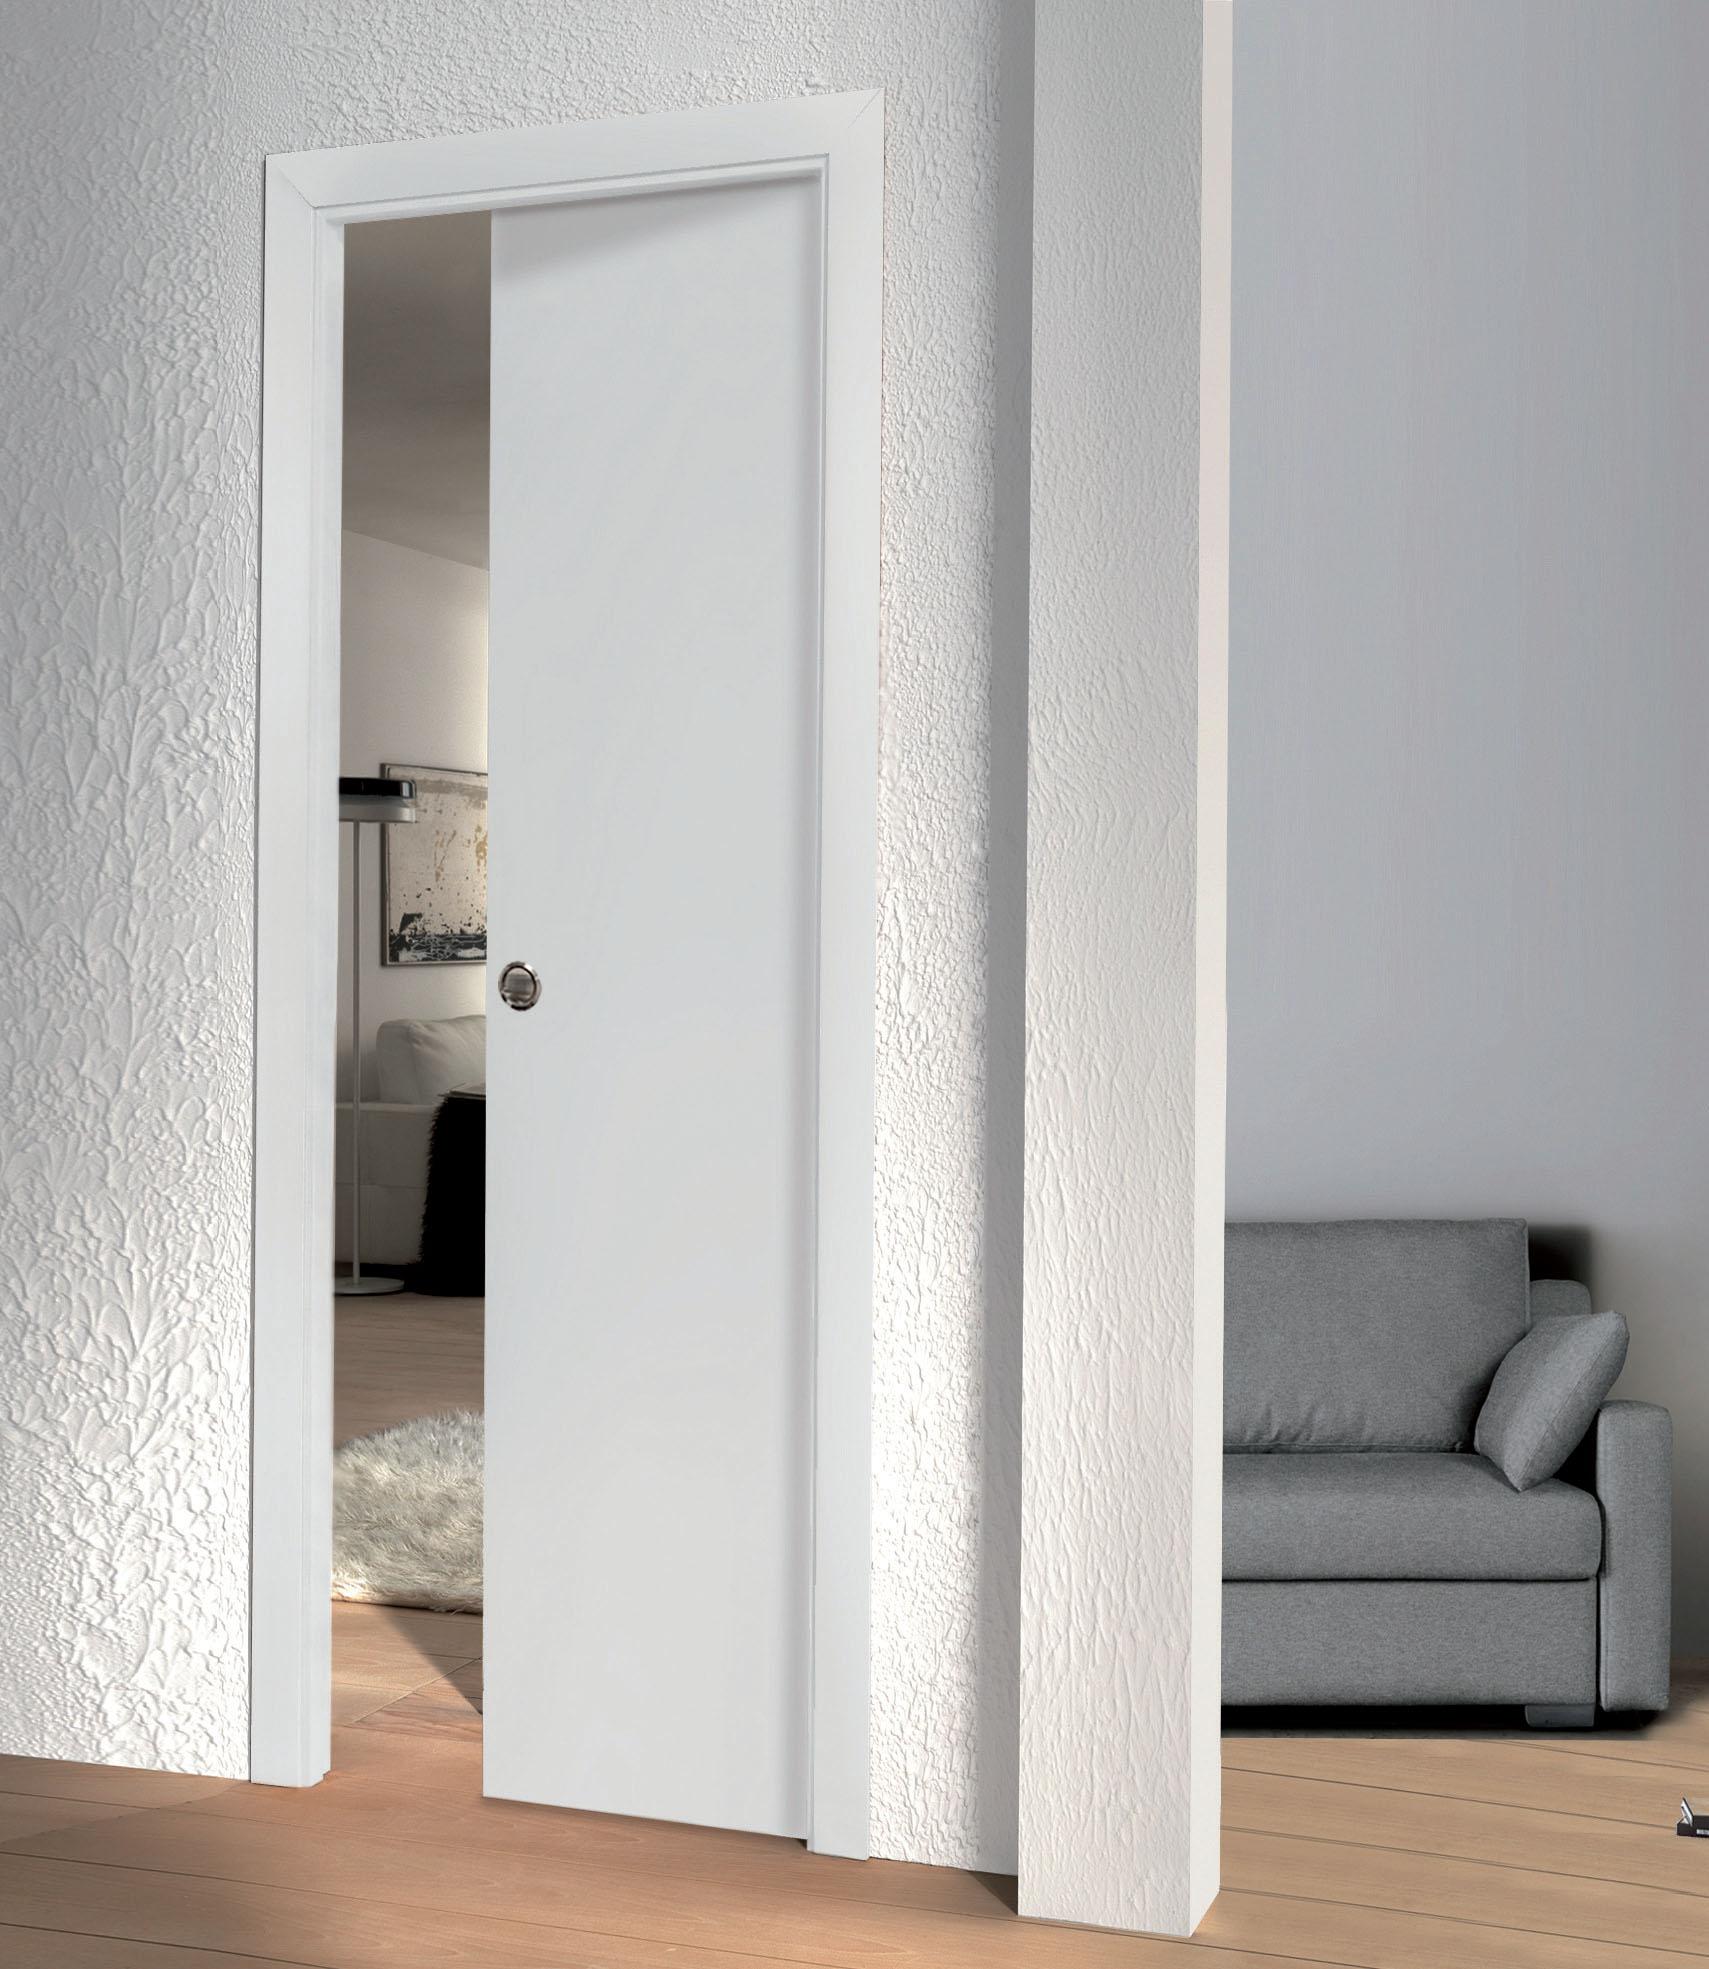 Puertas Olamendi Mod 4000 ~ Carriles Para Puertas Correderas